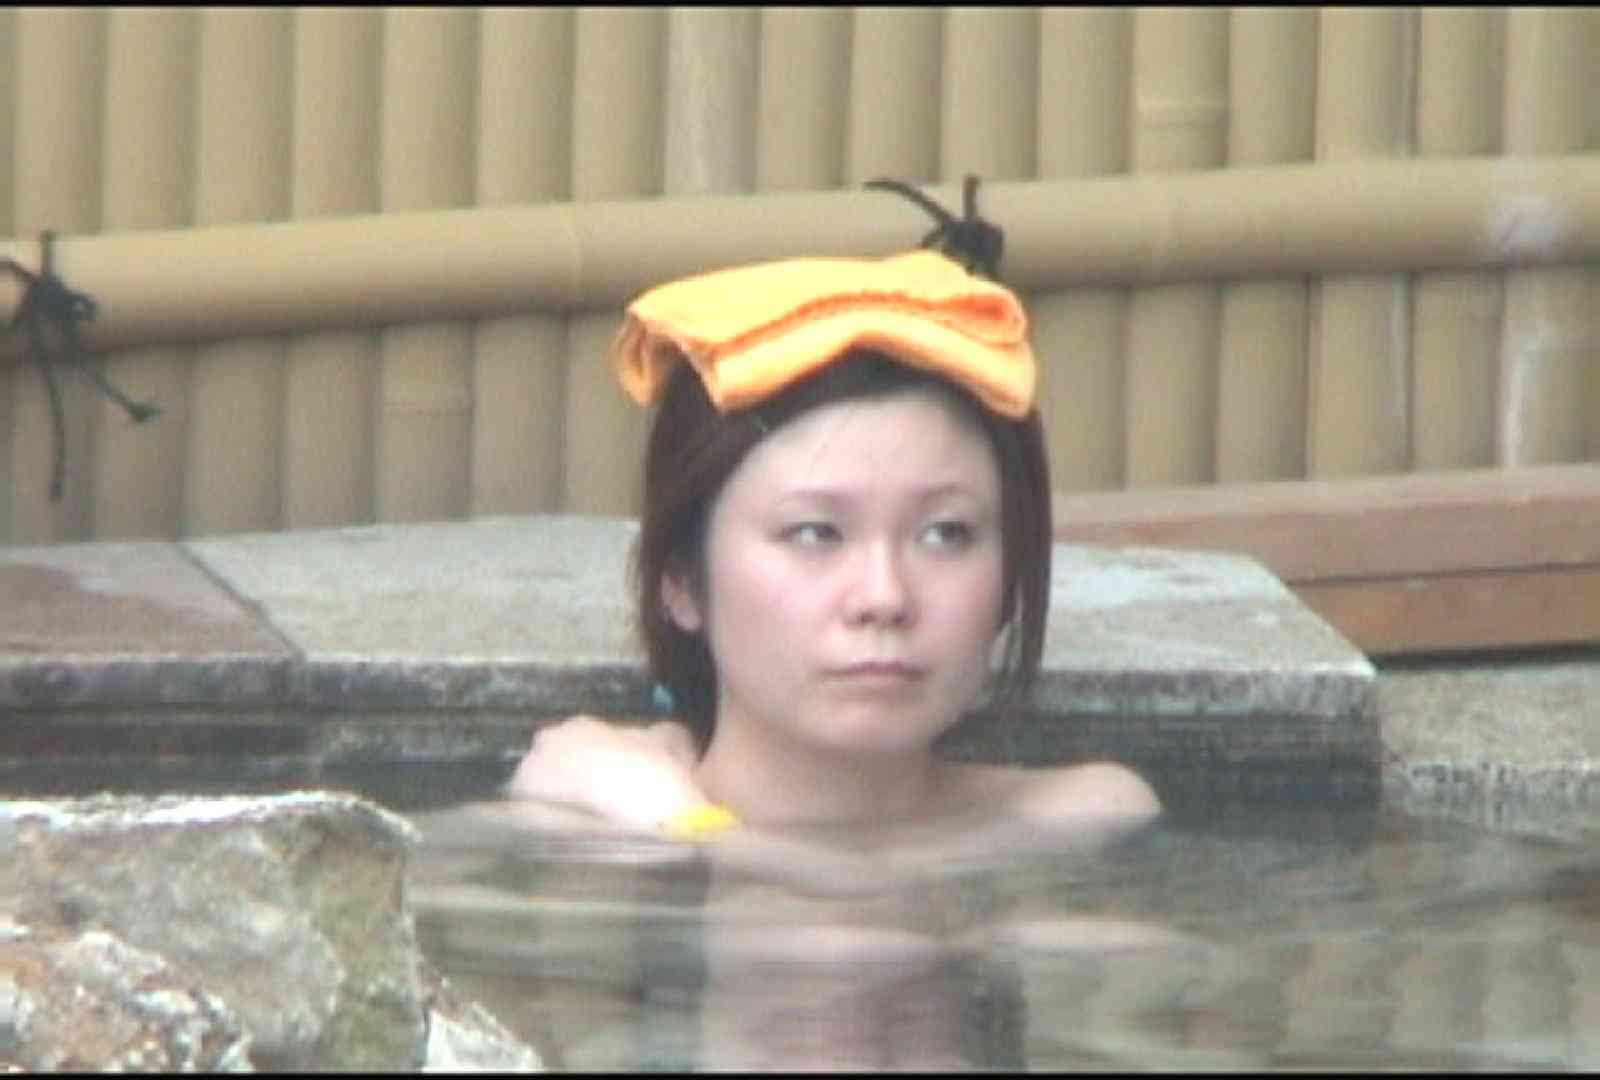 Aquaな露天風呂Vol.177 綺麗なOLたち アダルト動画キャプチャ 112枚 14